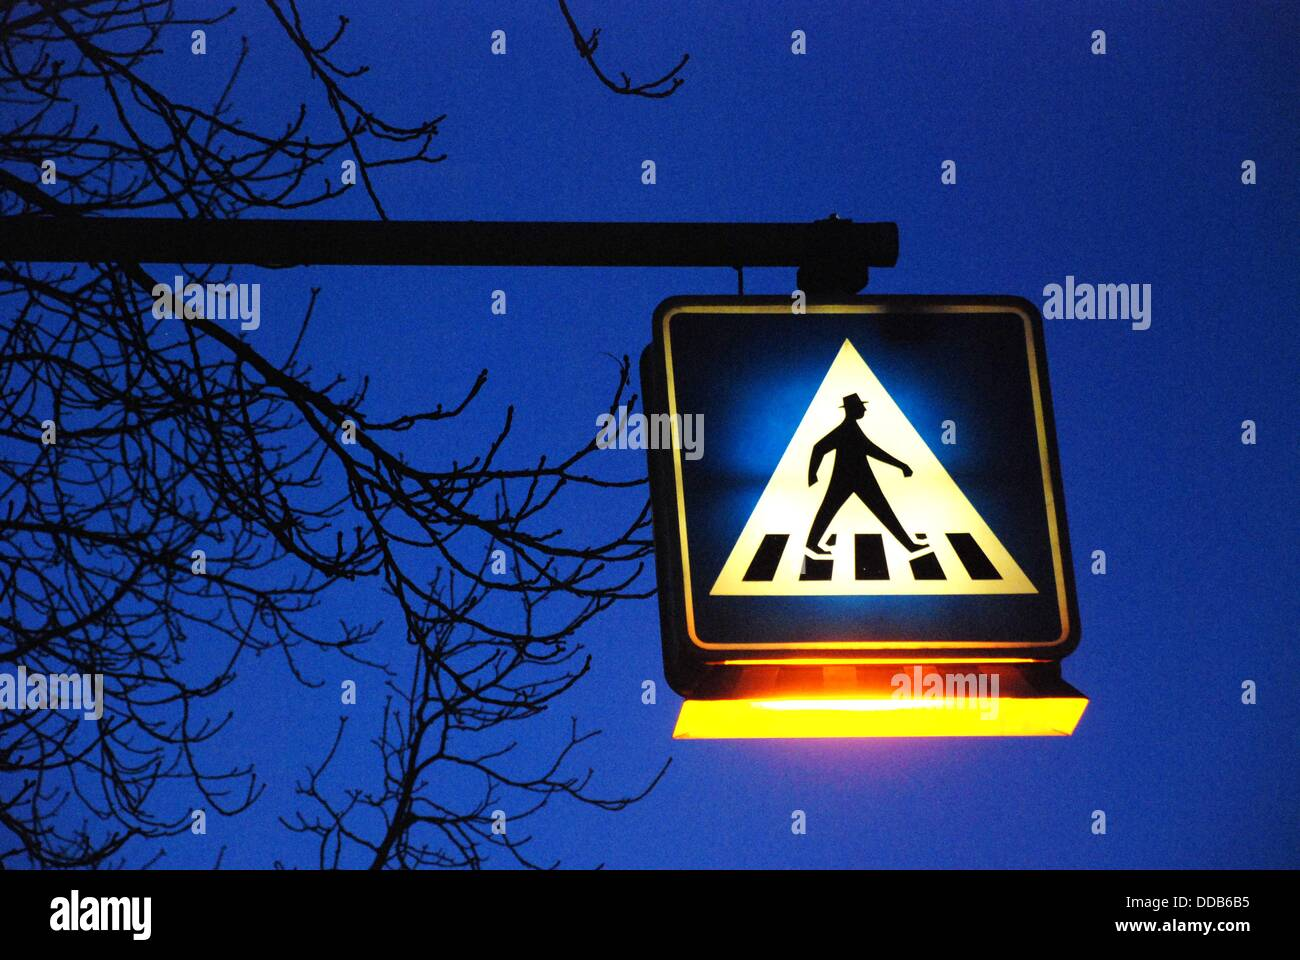 Illuminated pedestrian transition road sign - Stock Image